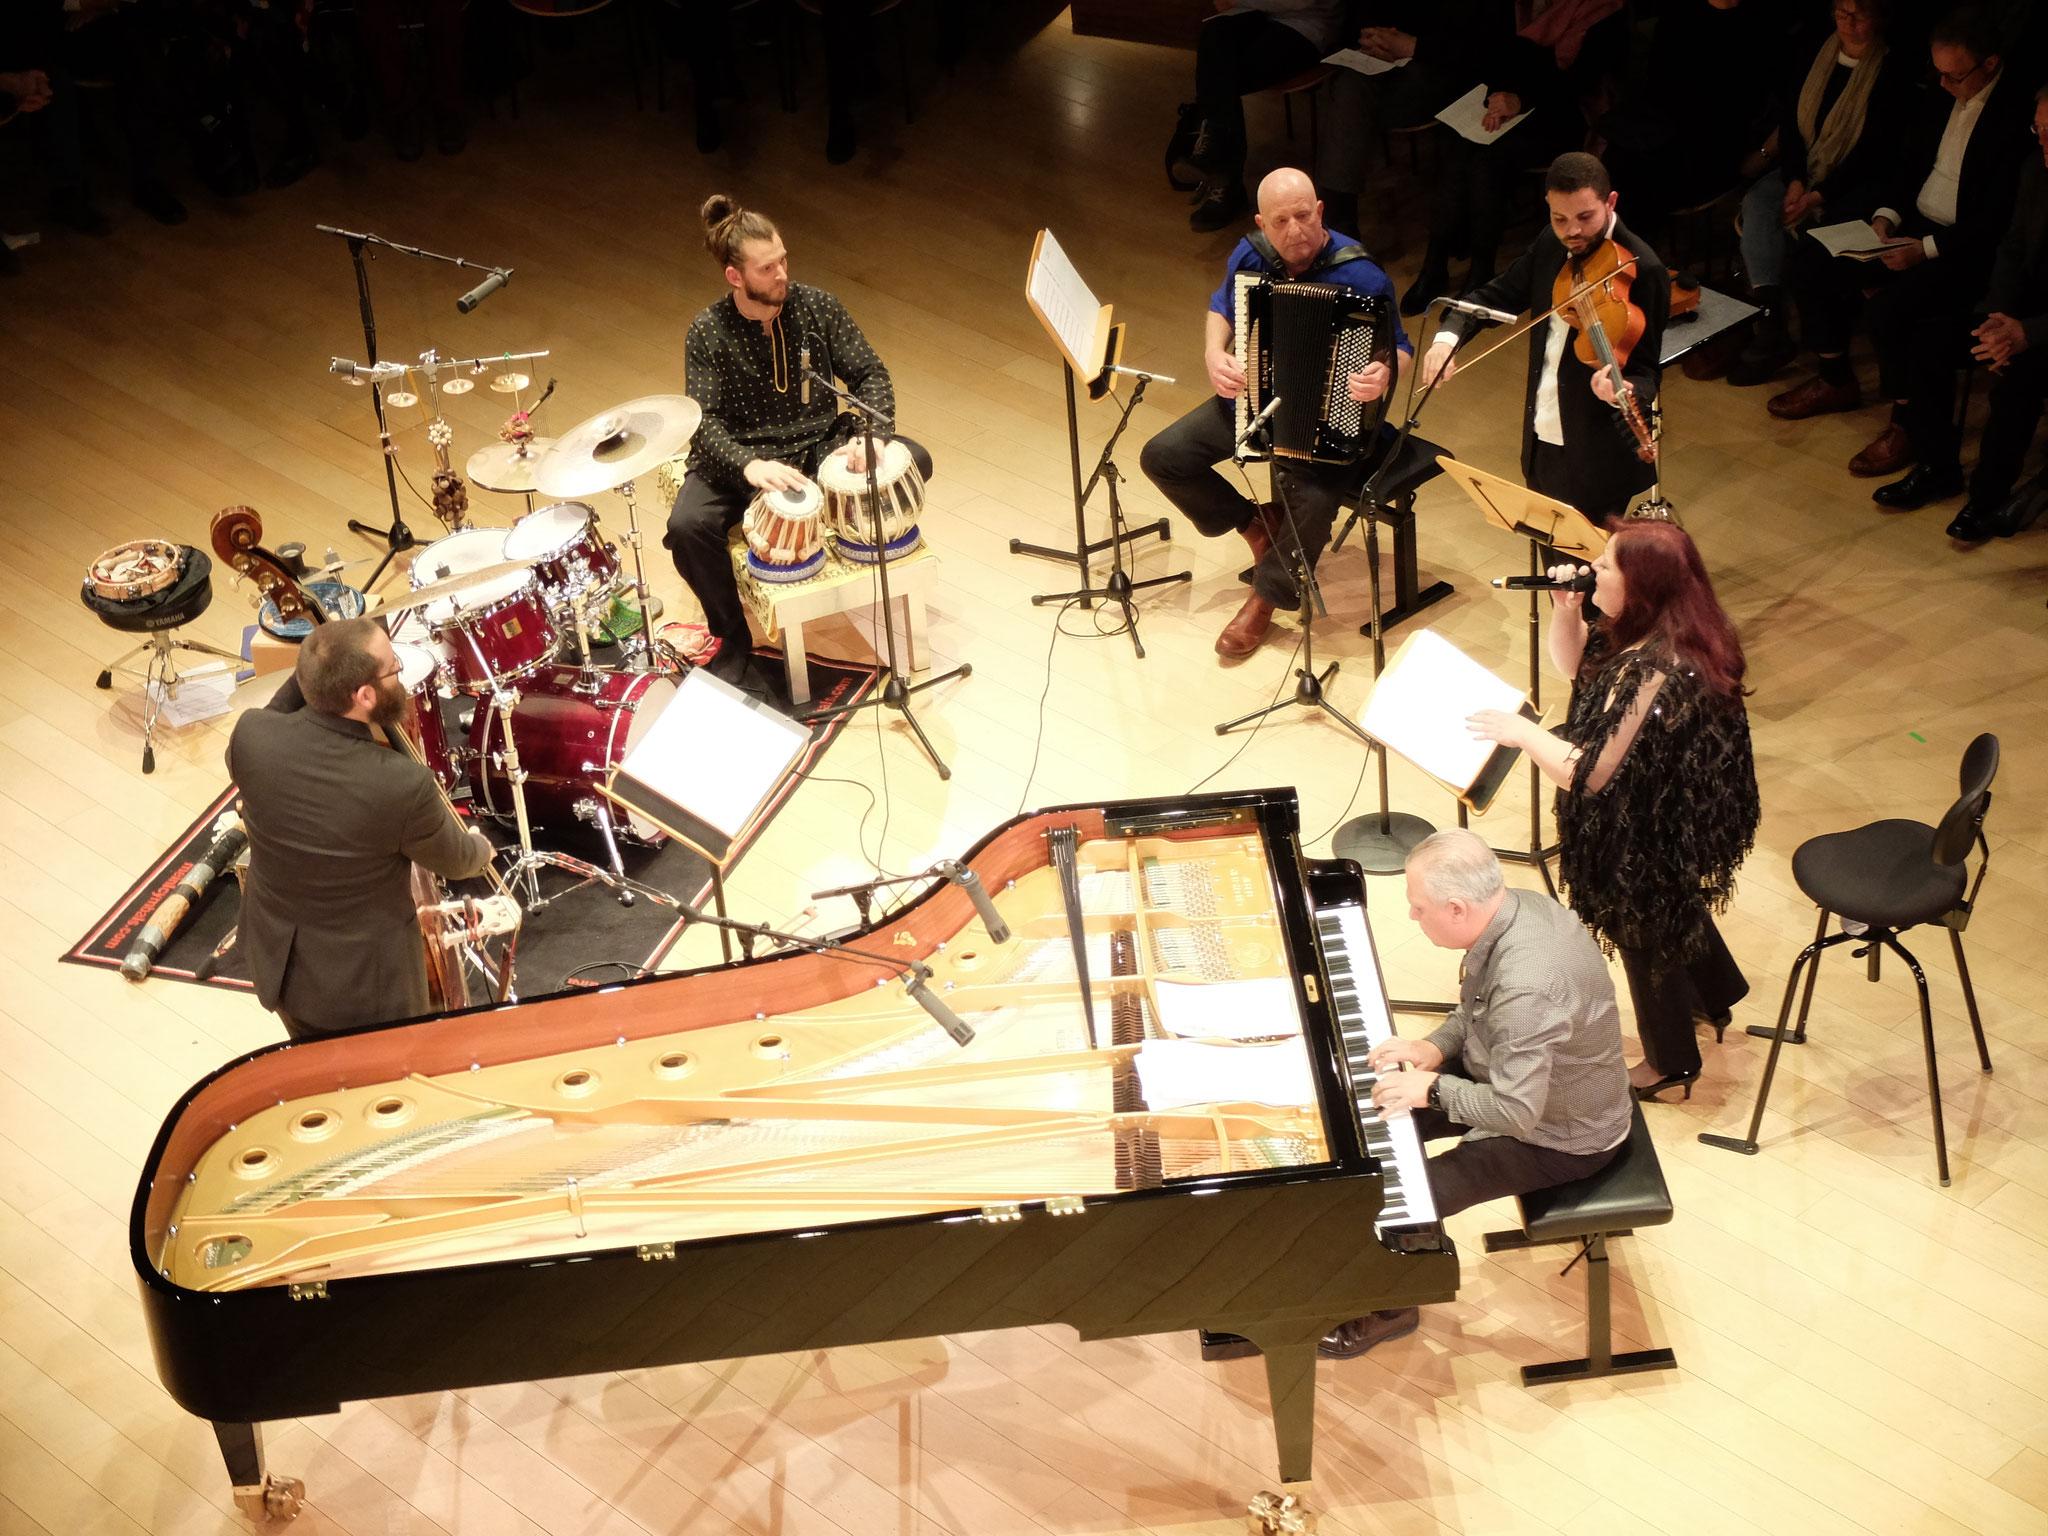 Mit Robert Landfermann, Bodek Janke, Jasser Haj Youssef, Dima Orsho und Salman Gambarov, Boulez-Saal Berlin